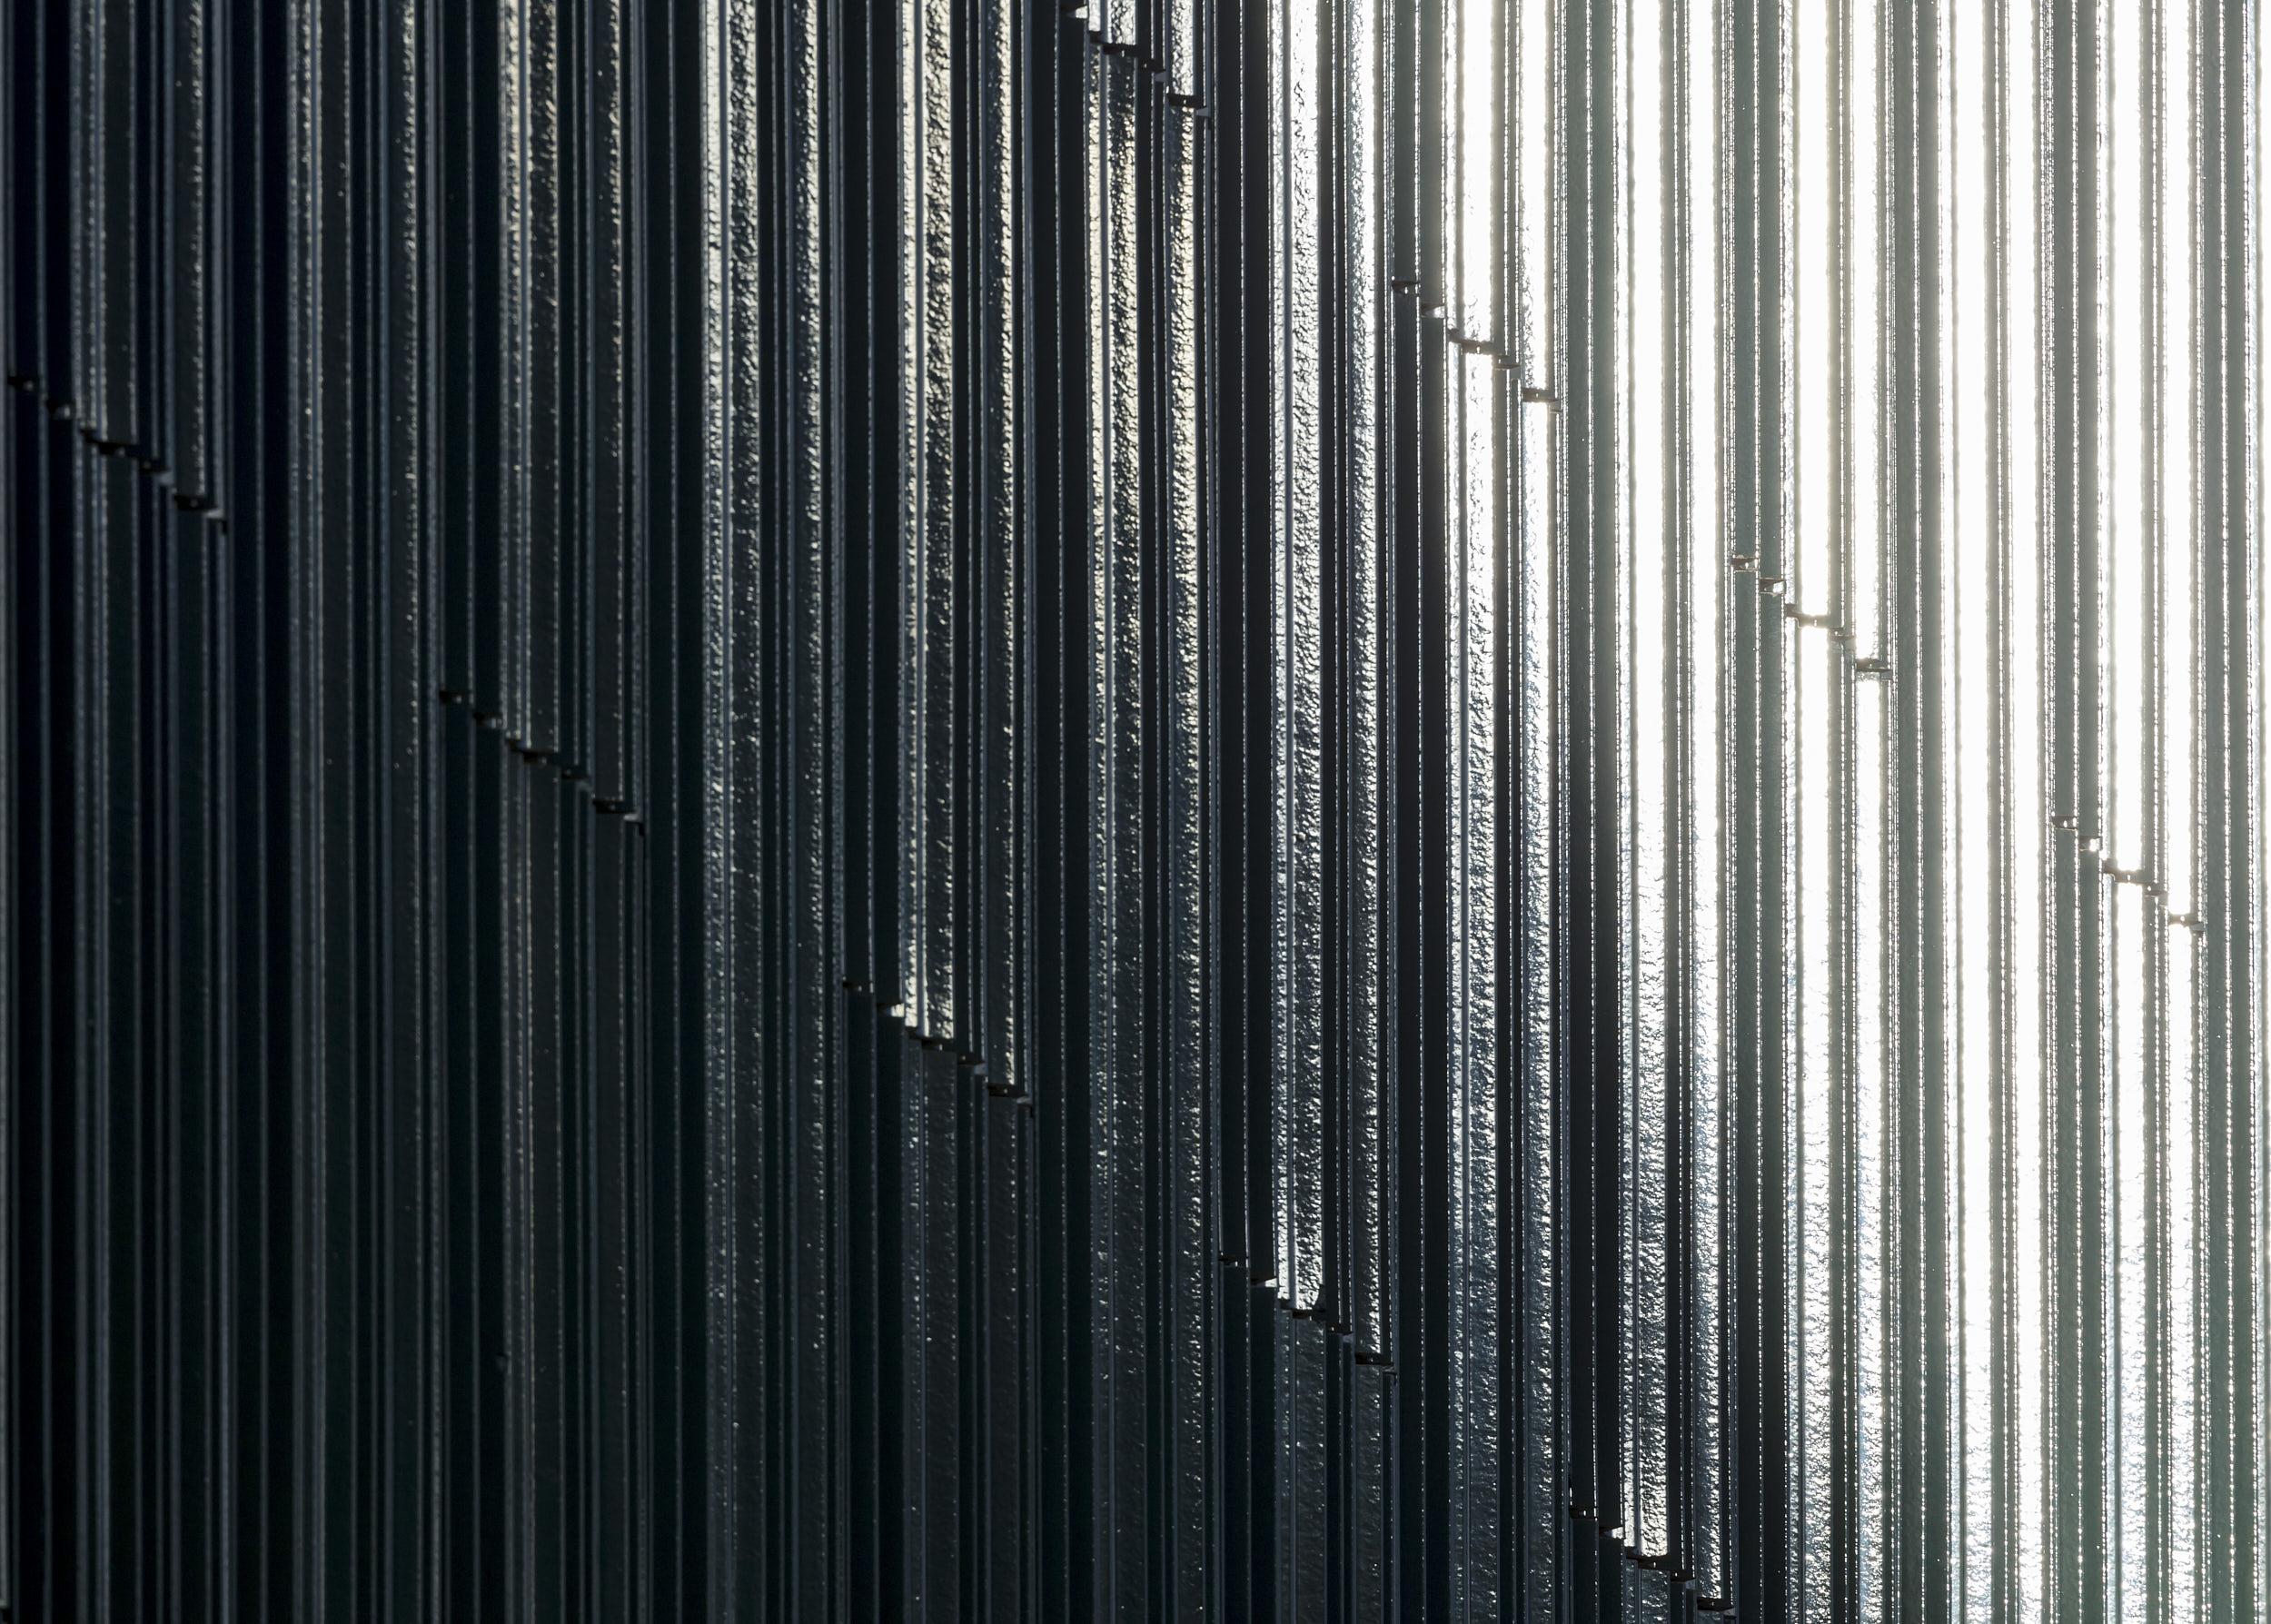 Exterior architectural cladding details photograph.